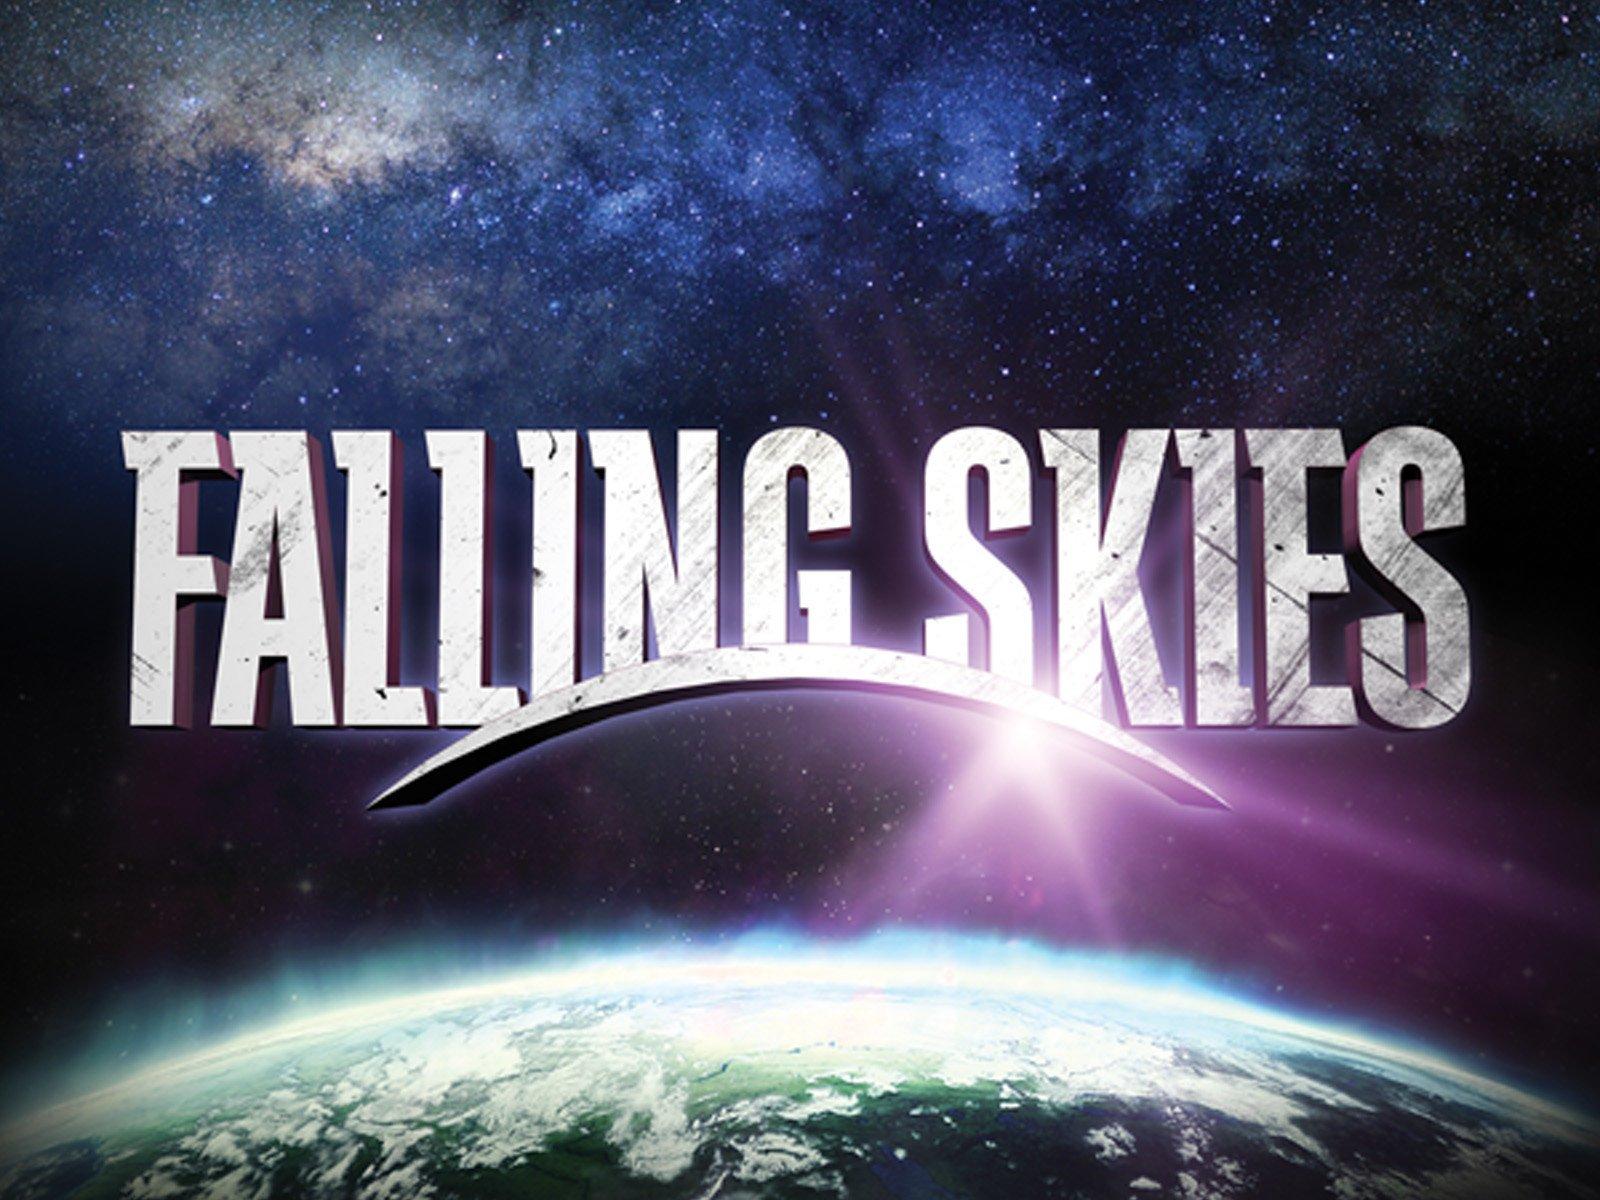 falling skies season 5 episode 1 watch online